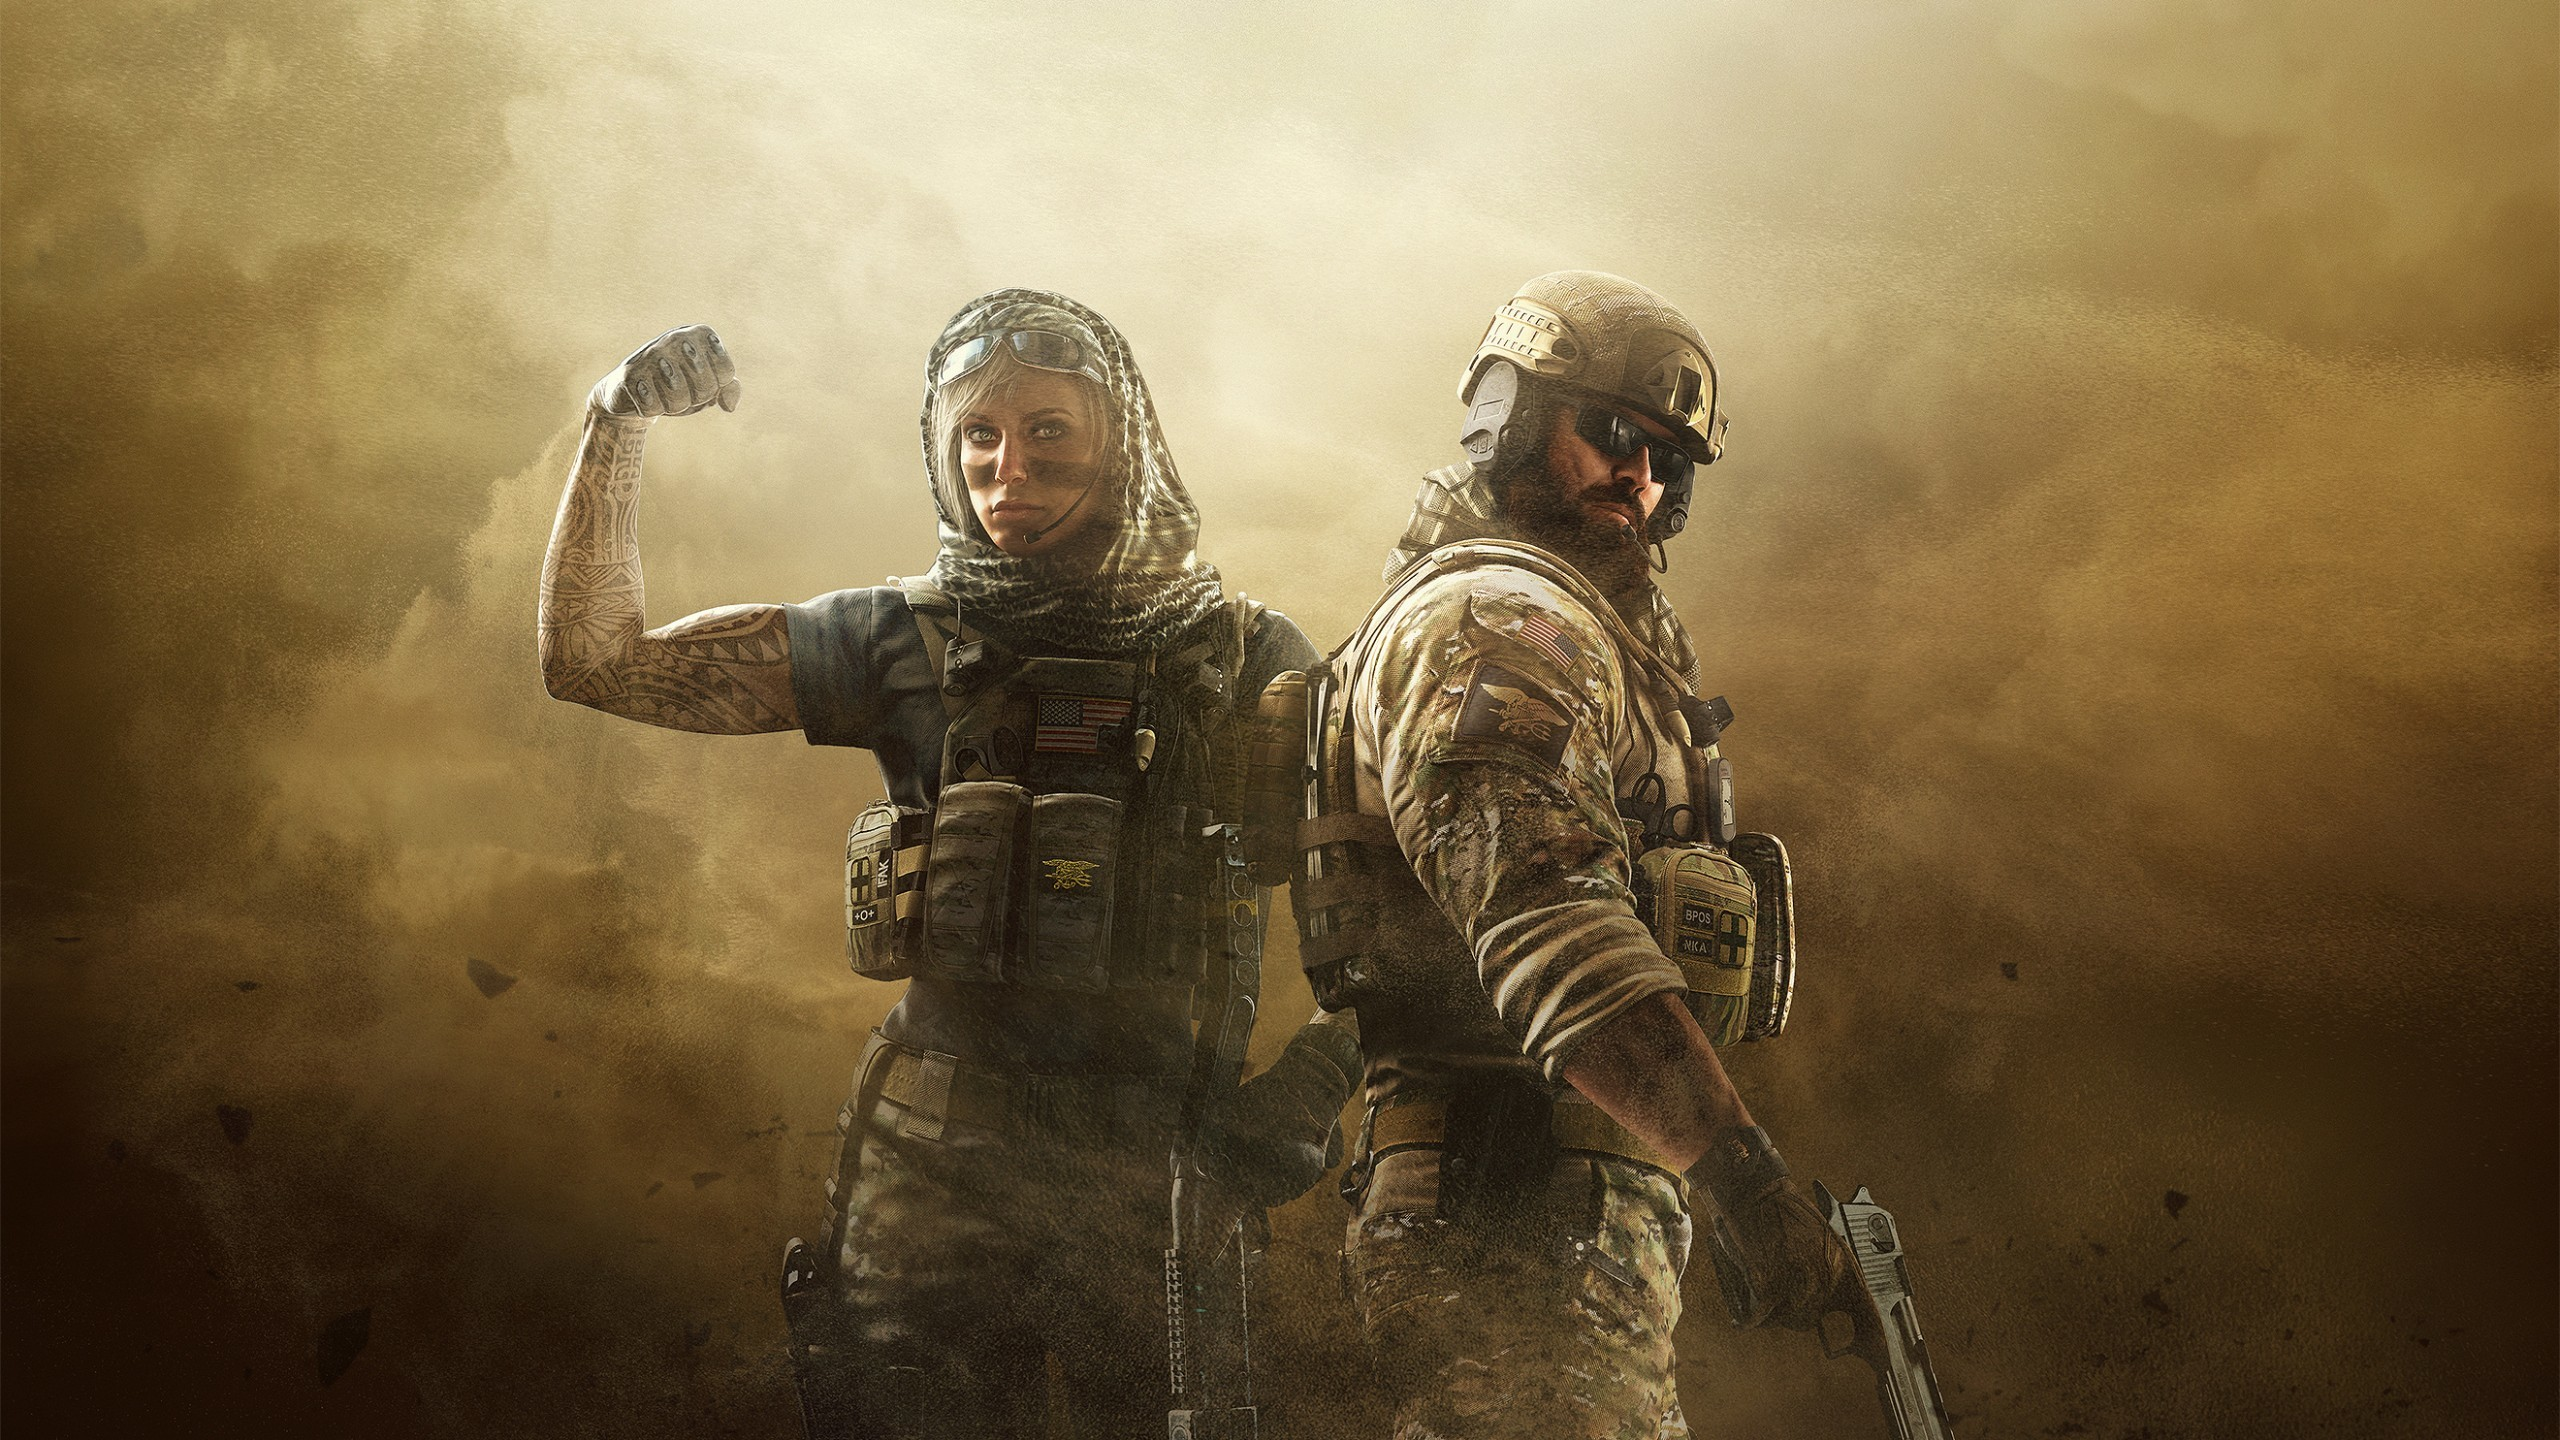 Games / Blackbeard Wallpaper